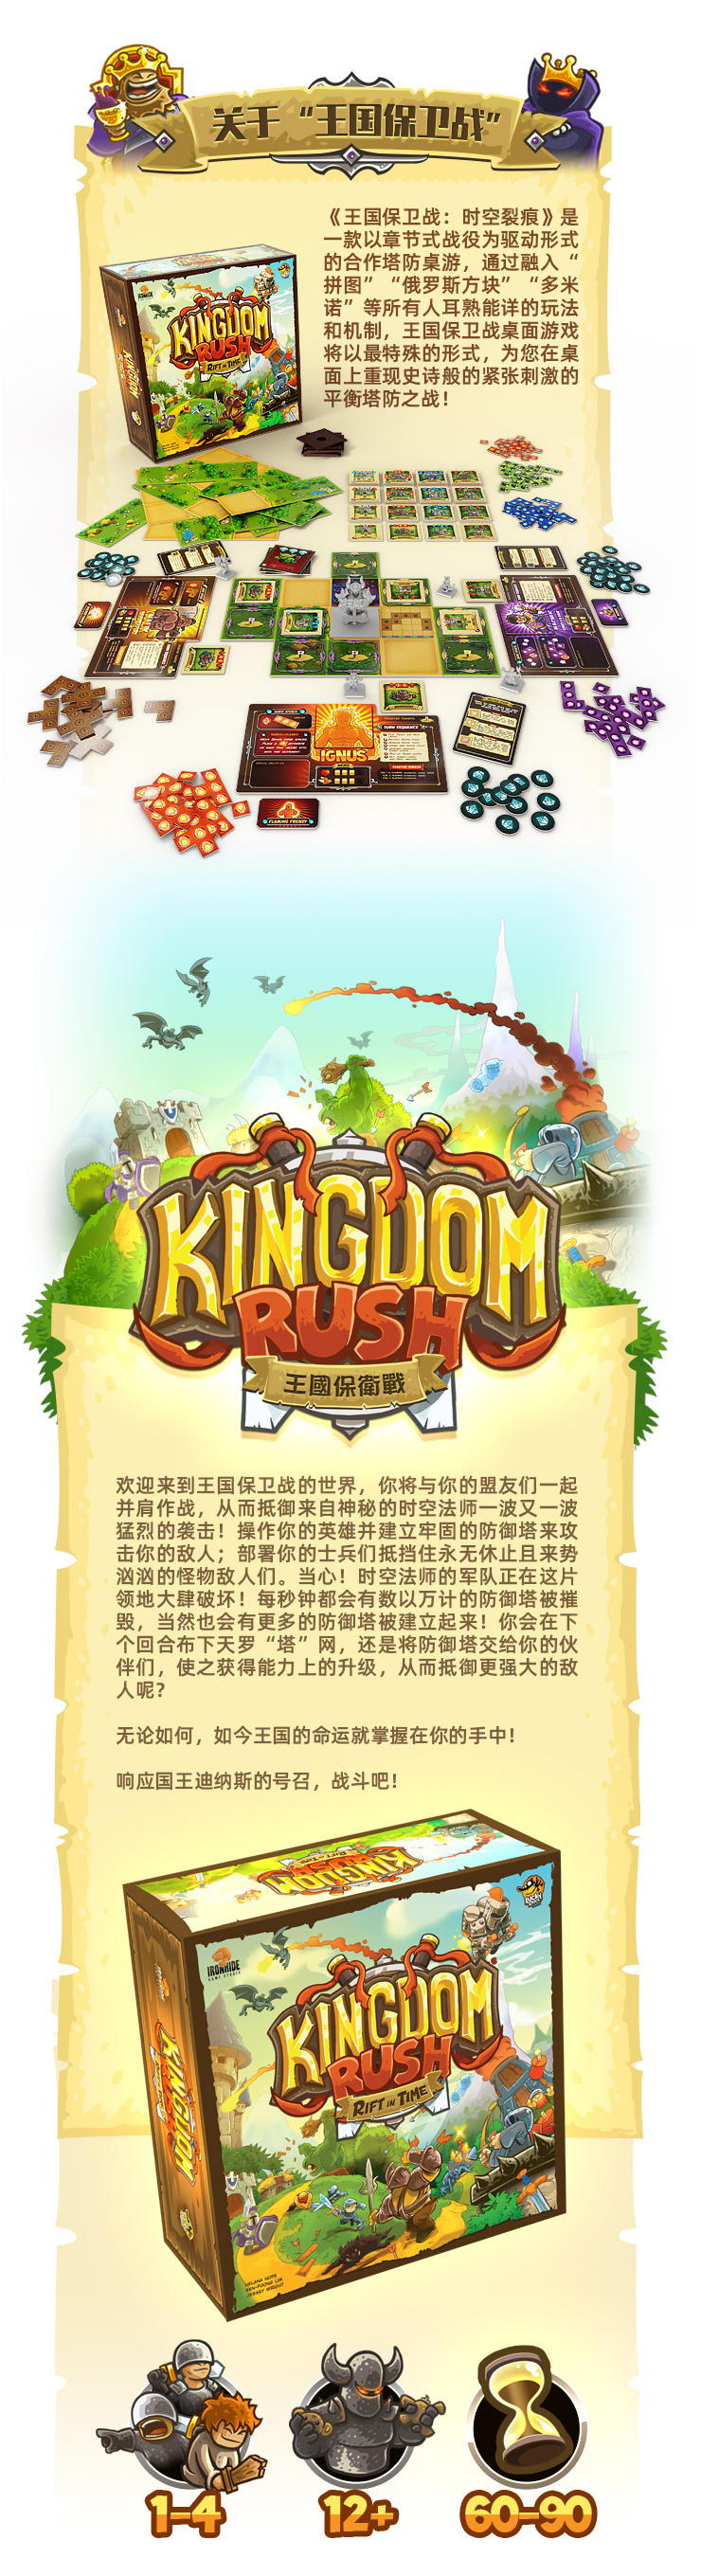 Kingdom-Rush--DE_02.jpg